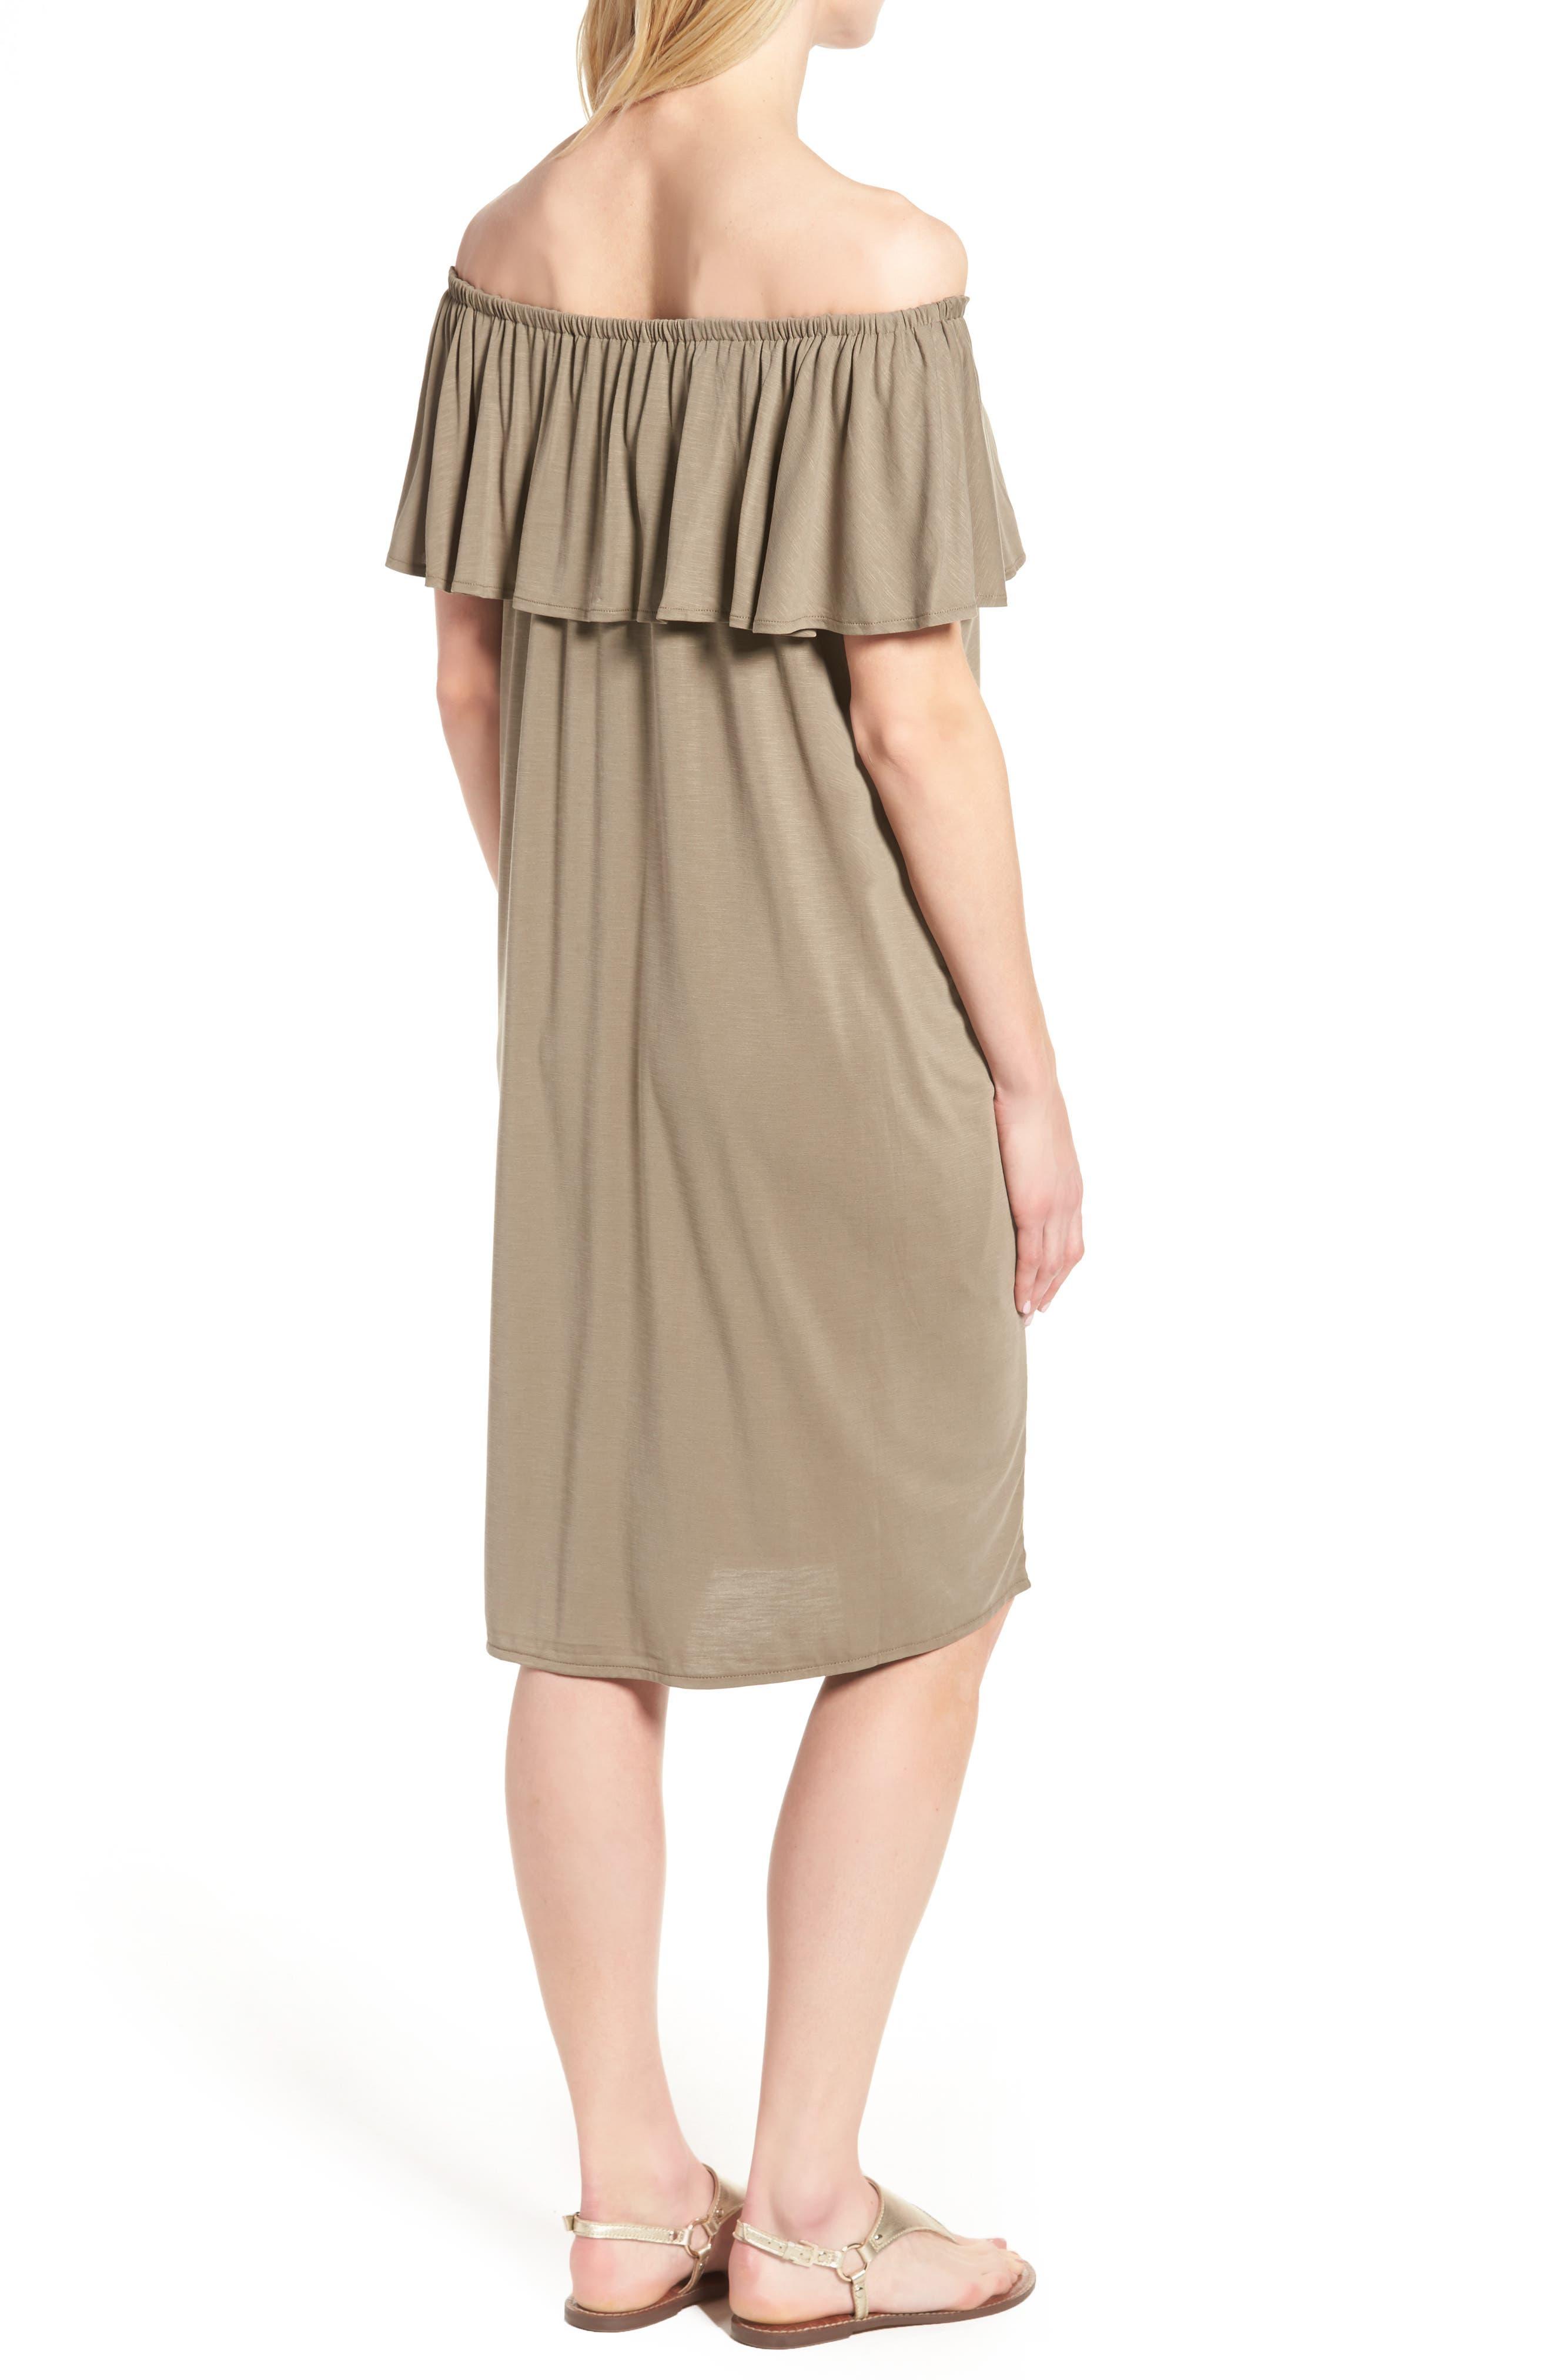 Boardwalk Convertible Jersey Dress,                             Alternate thumbnail 2, color,                             Washed Marshland